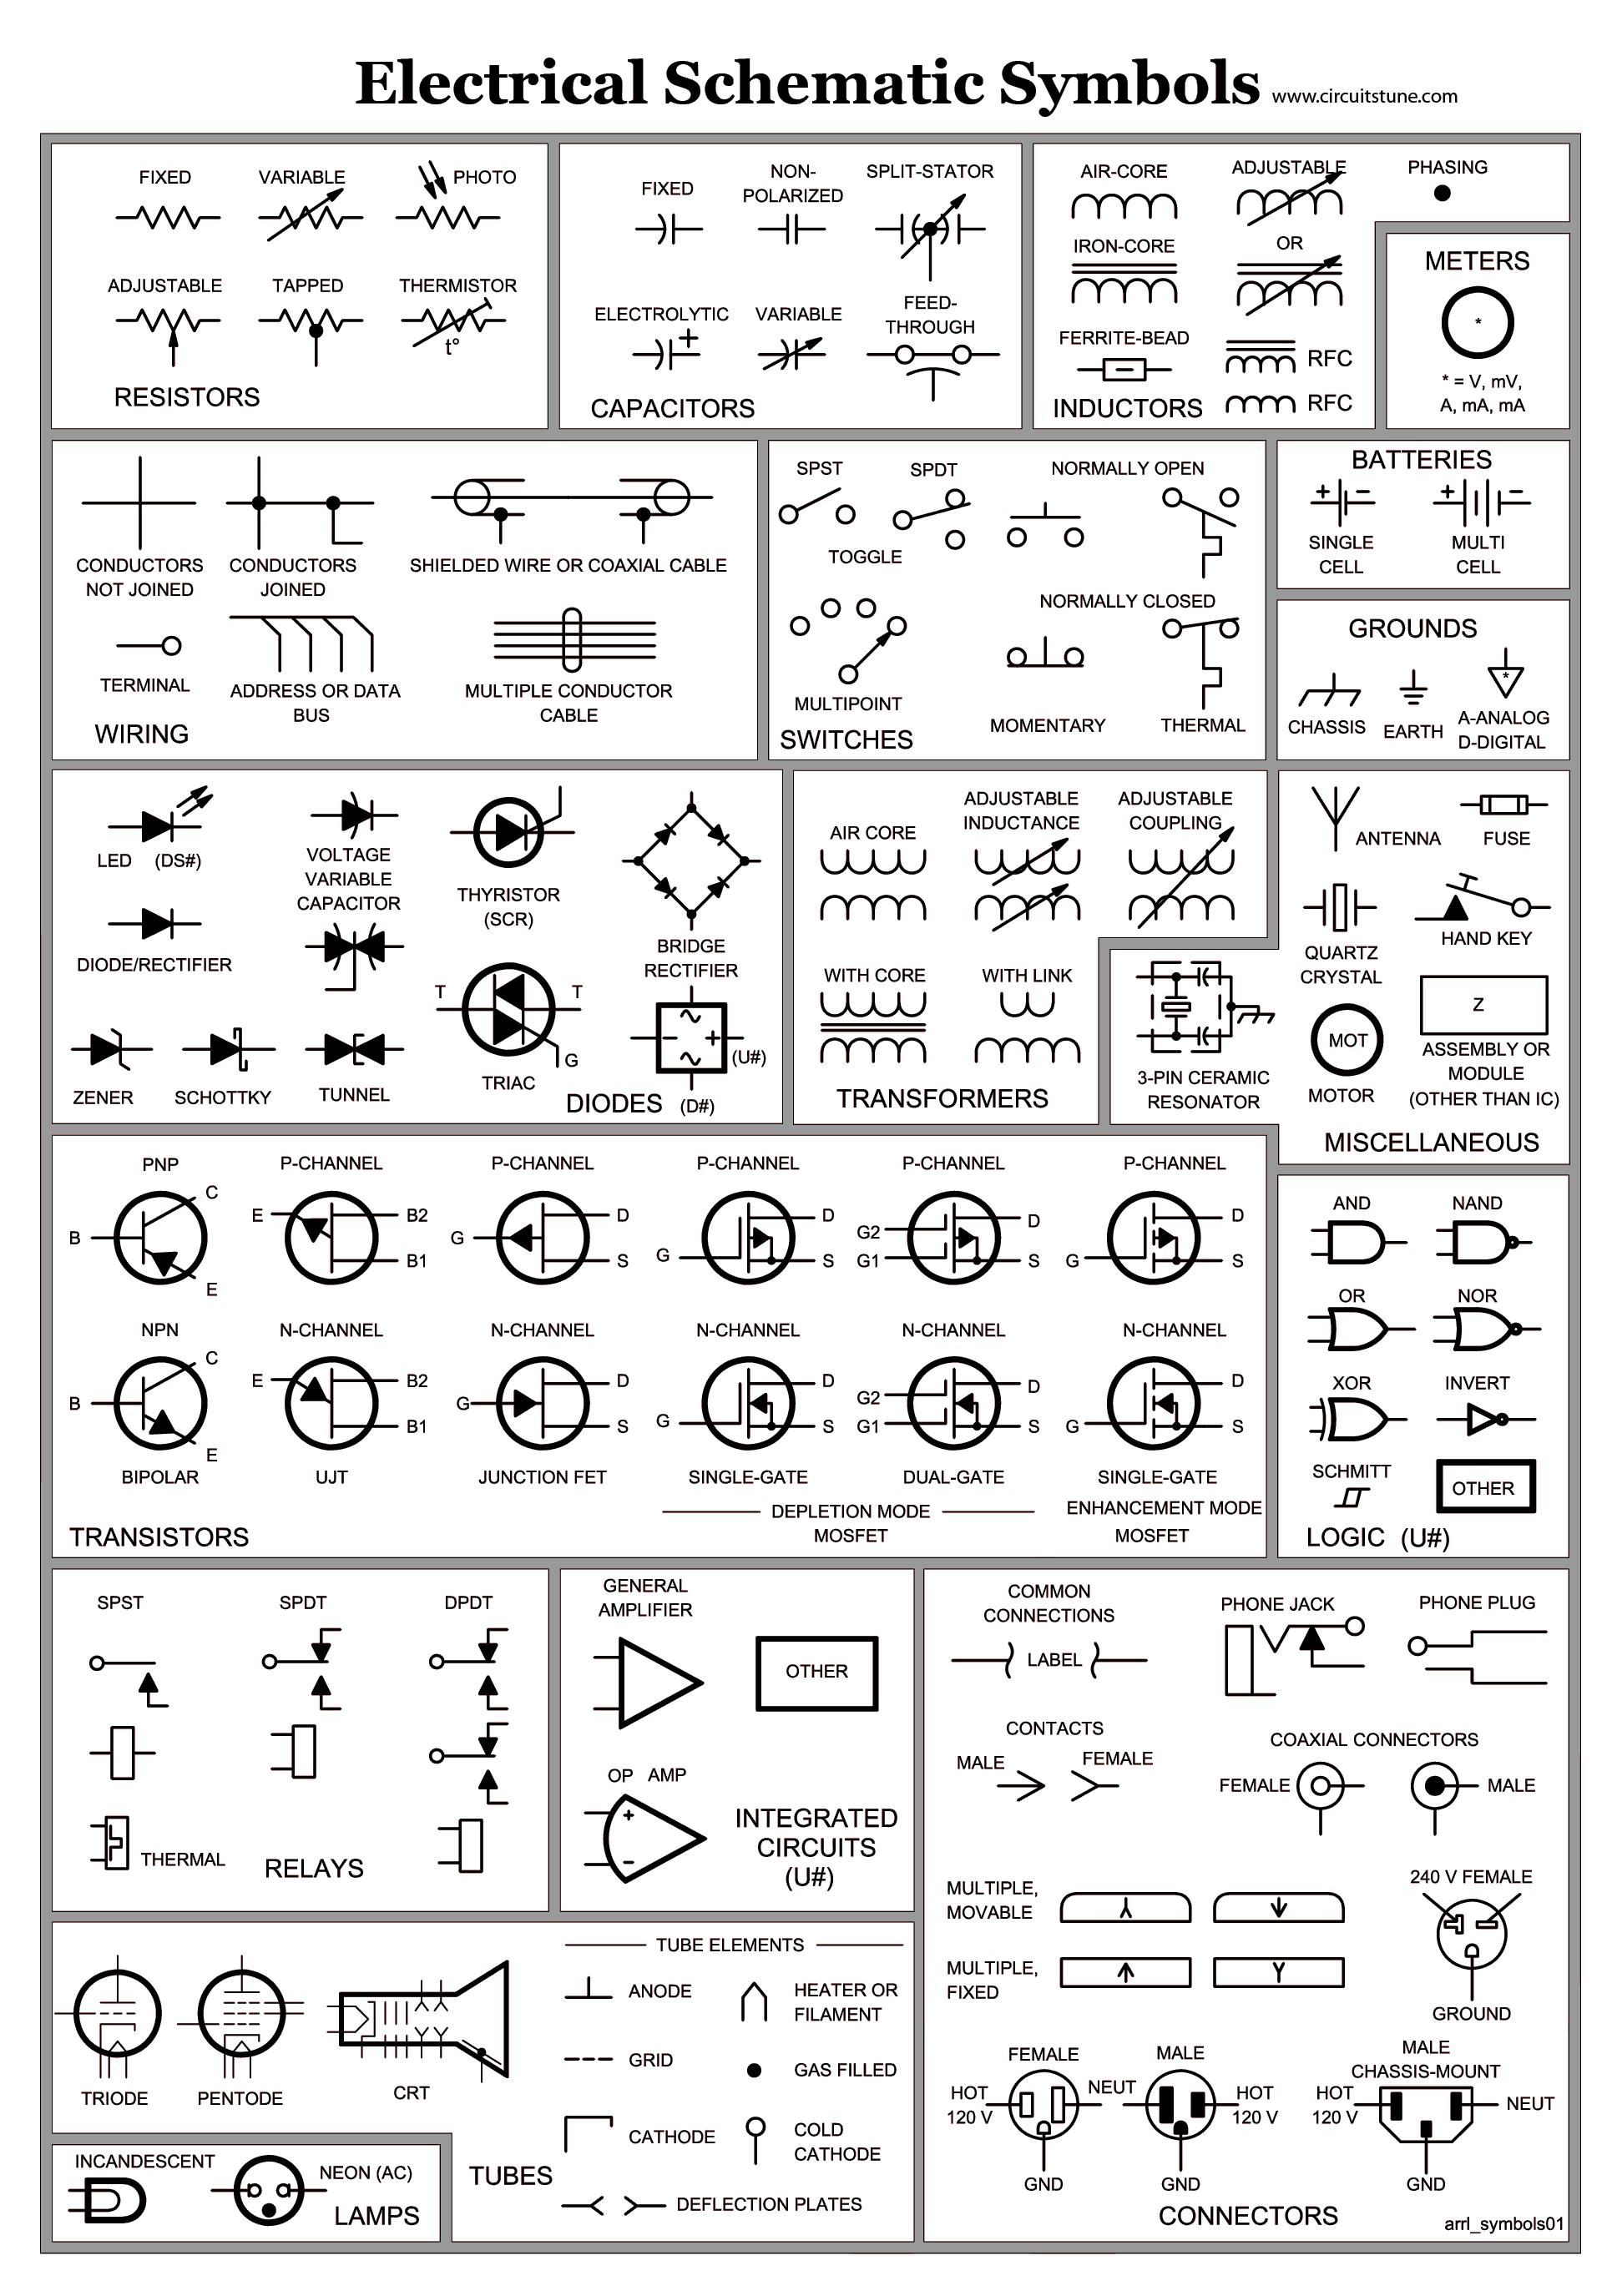 Electrical Schematic Symbols   Skinsquiggles   Pinterest - Wiring Diagram Symbols